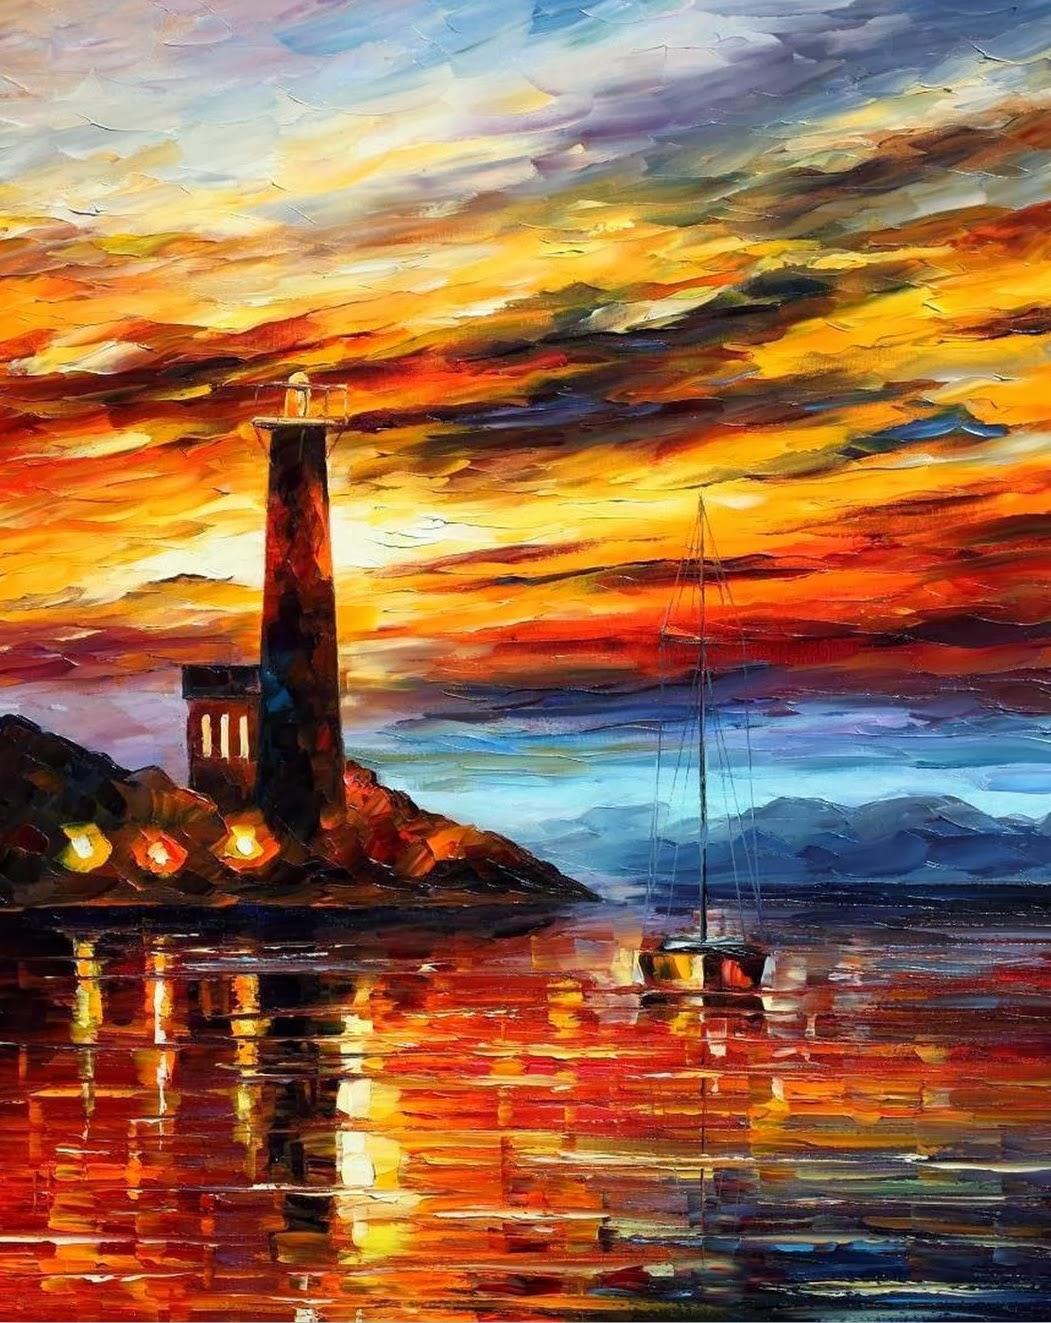 Pintura Al Oleo Paisajes Marinos Imagenes Arte Pinturas Oleos